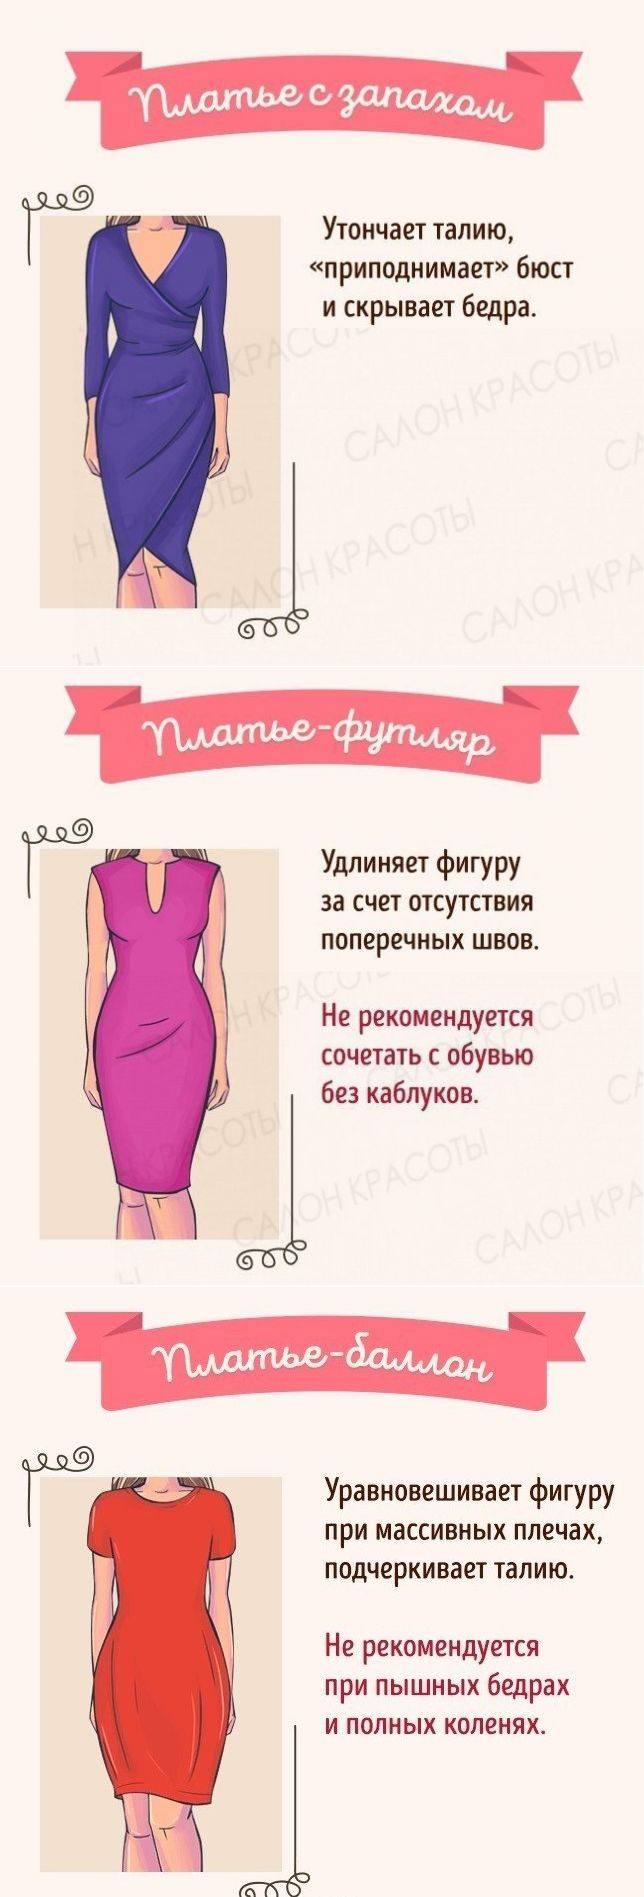 glammour.ru